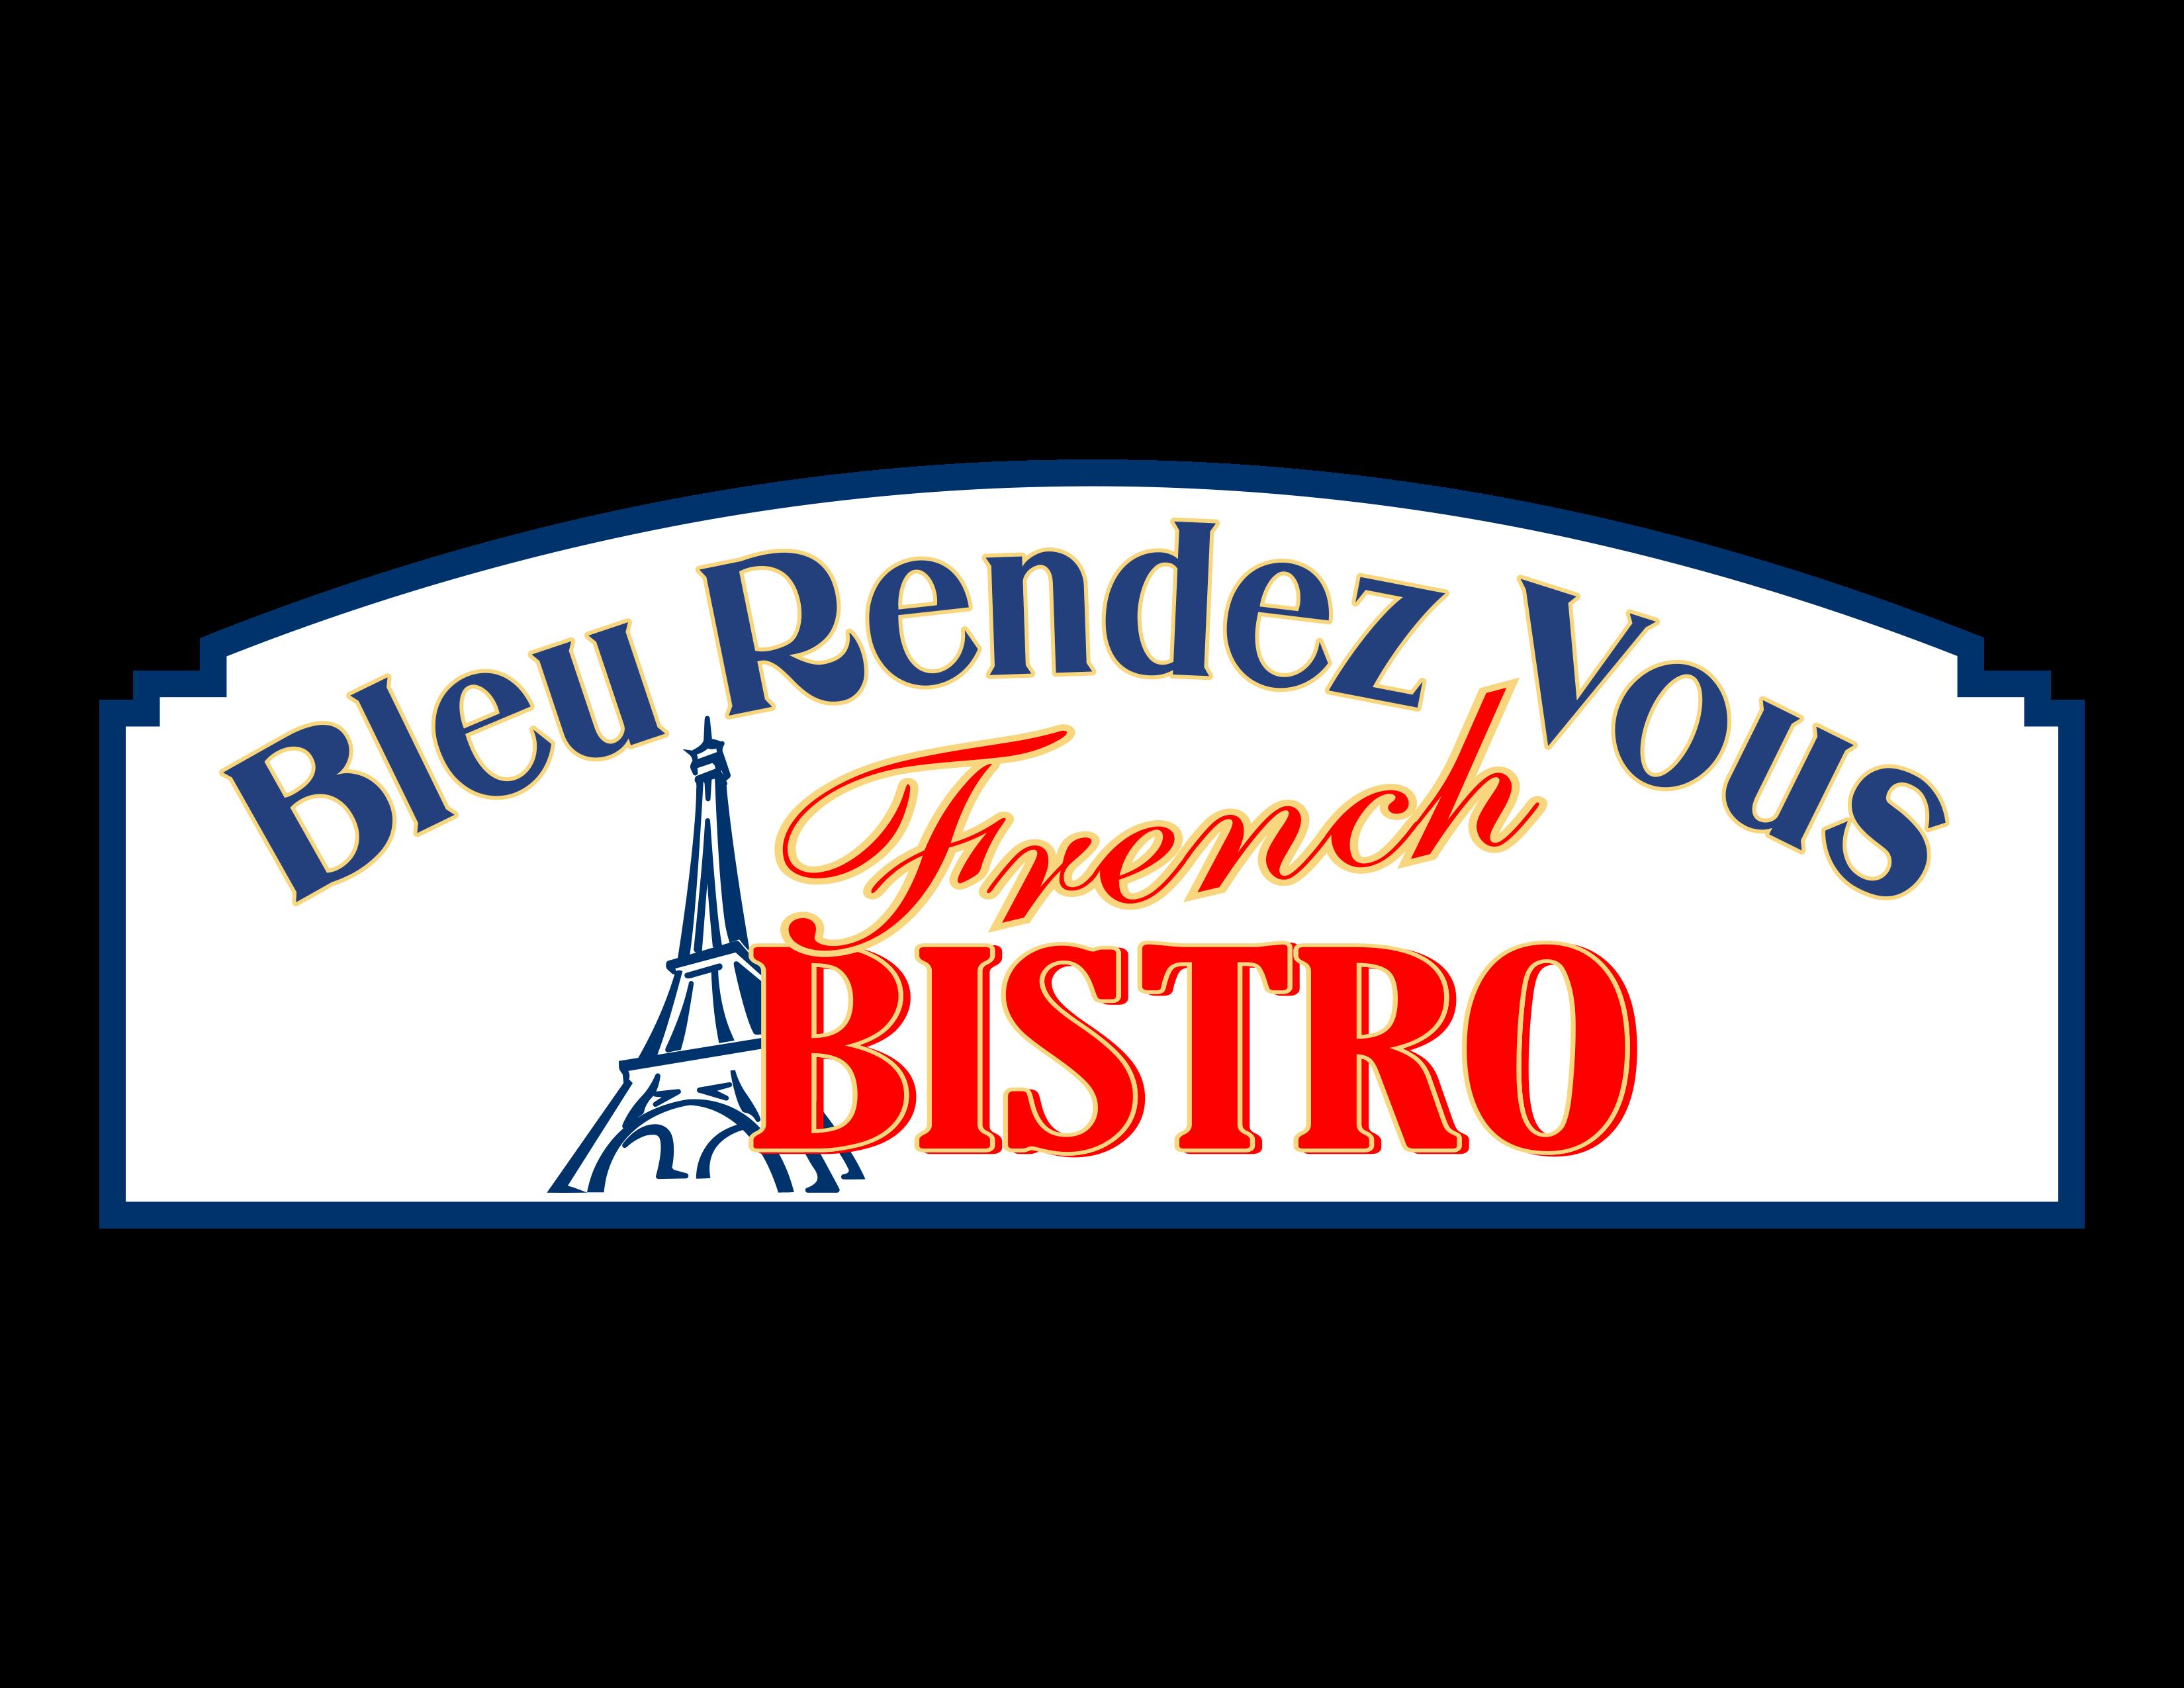 Blue Rendezvous Bistro